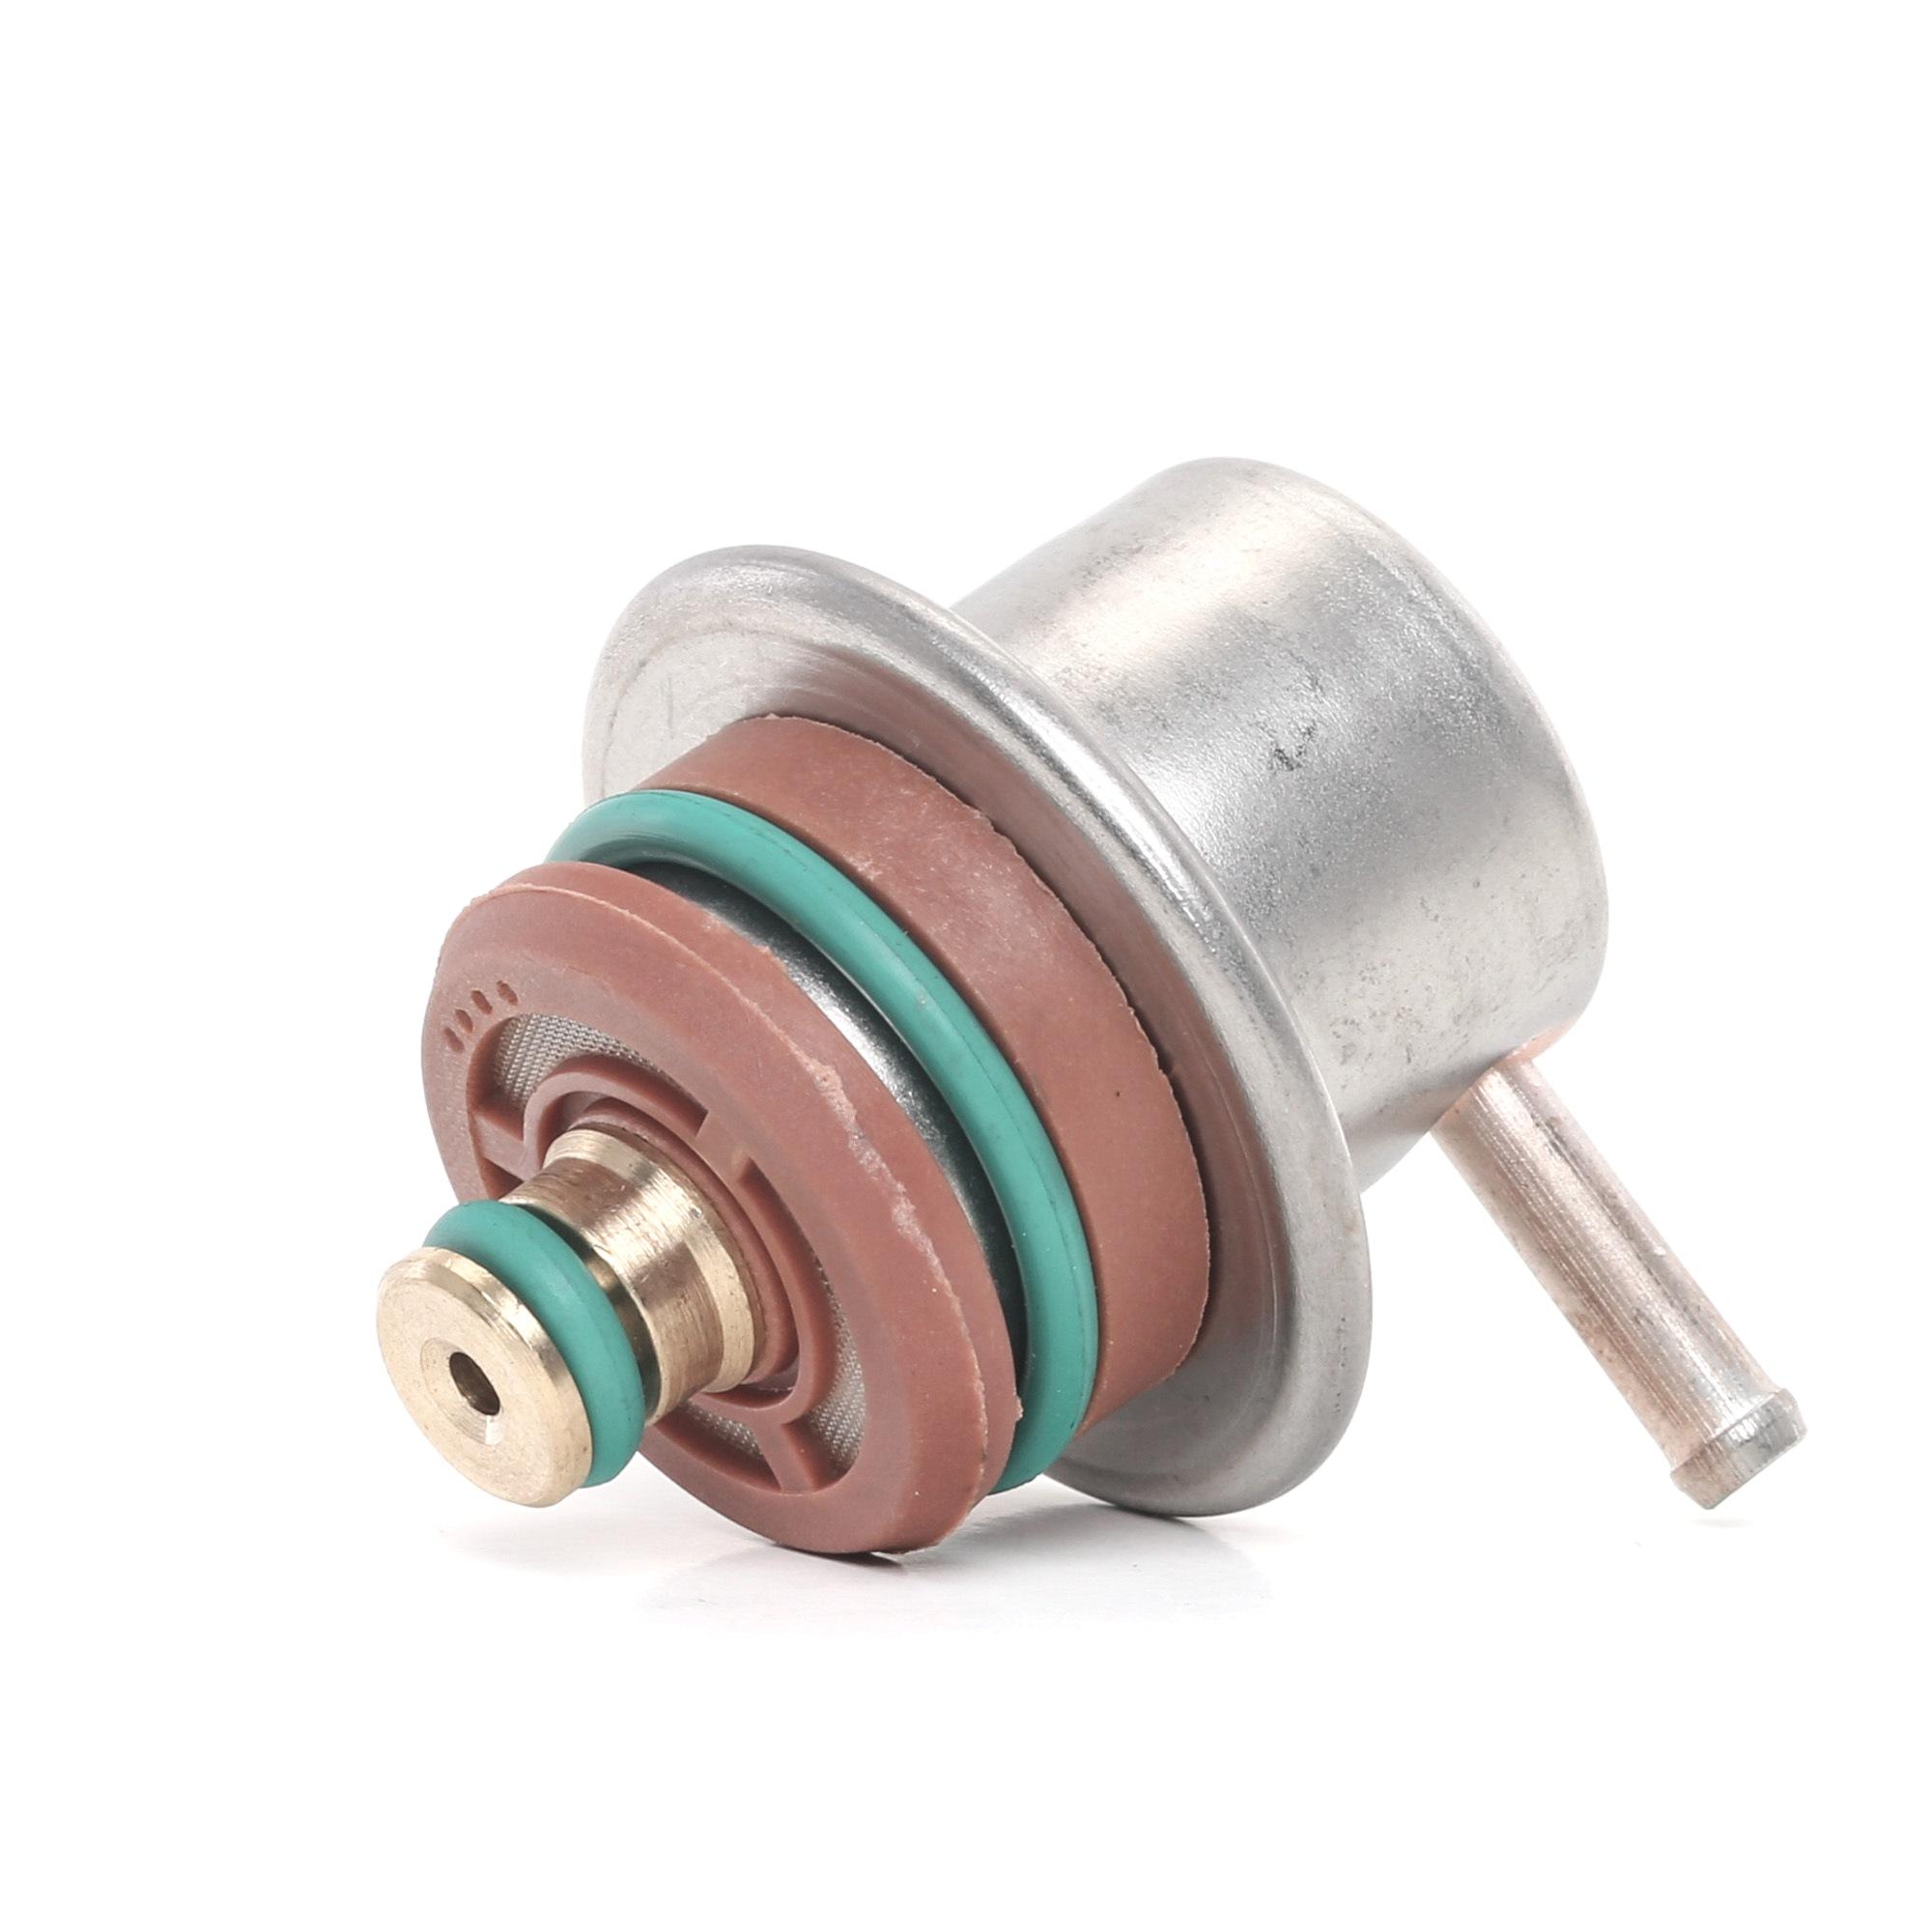 AUDI E-TRON Kraftstoffdruckregler - Original RIDEX 168C0002